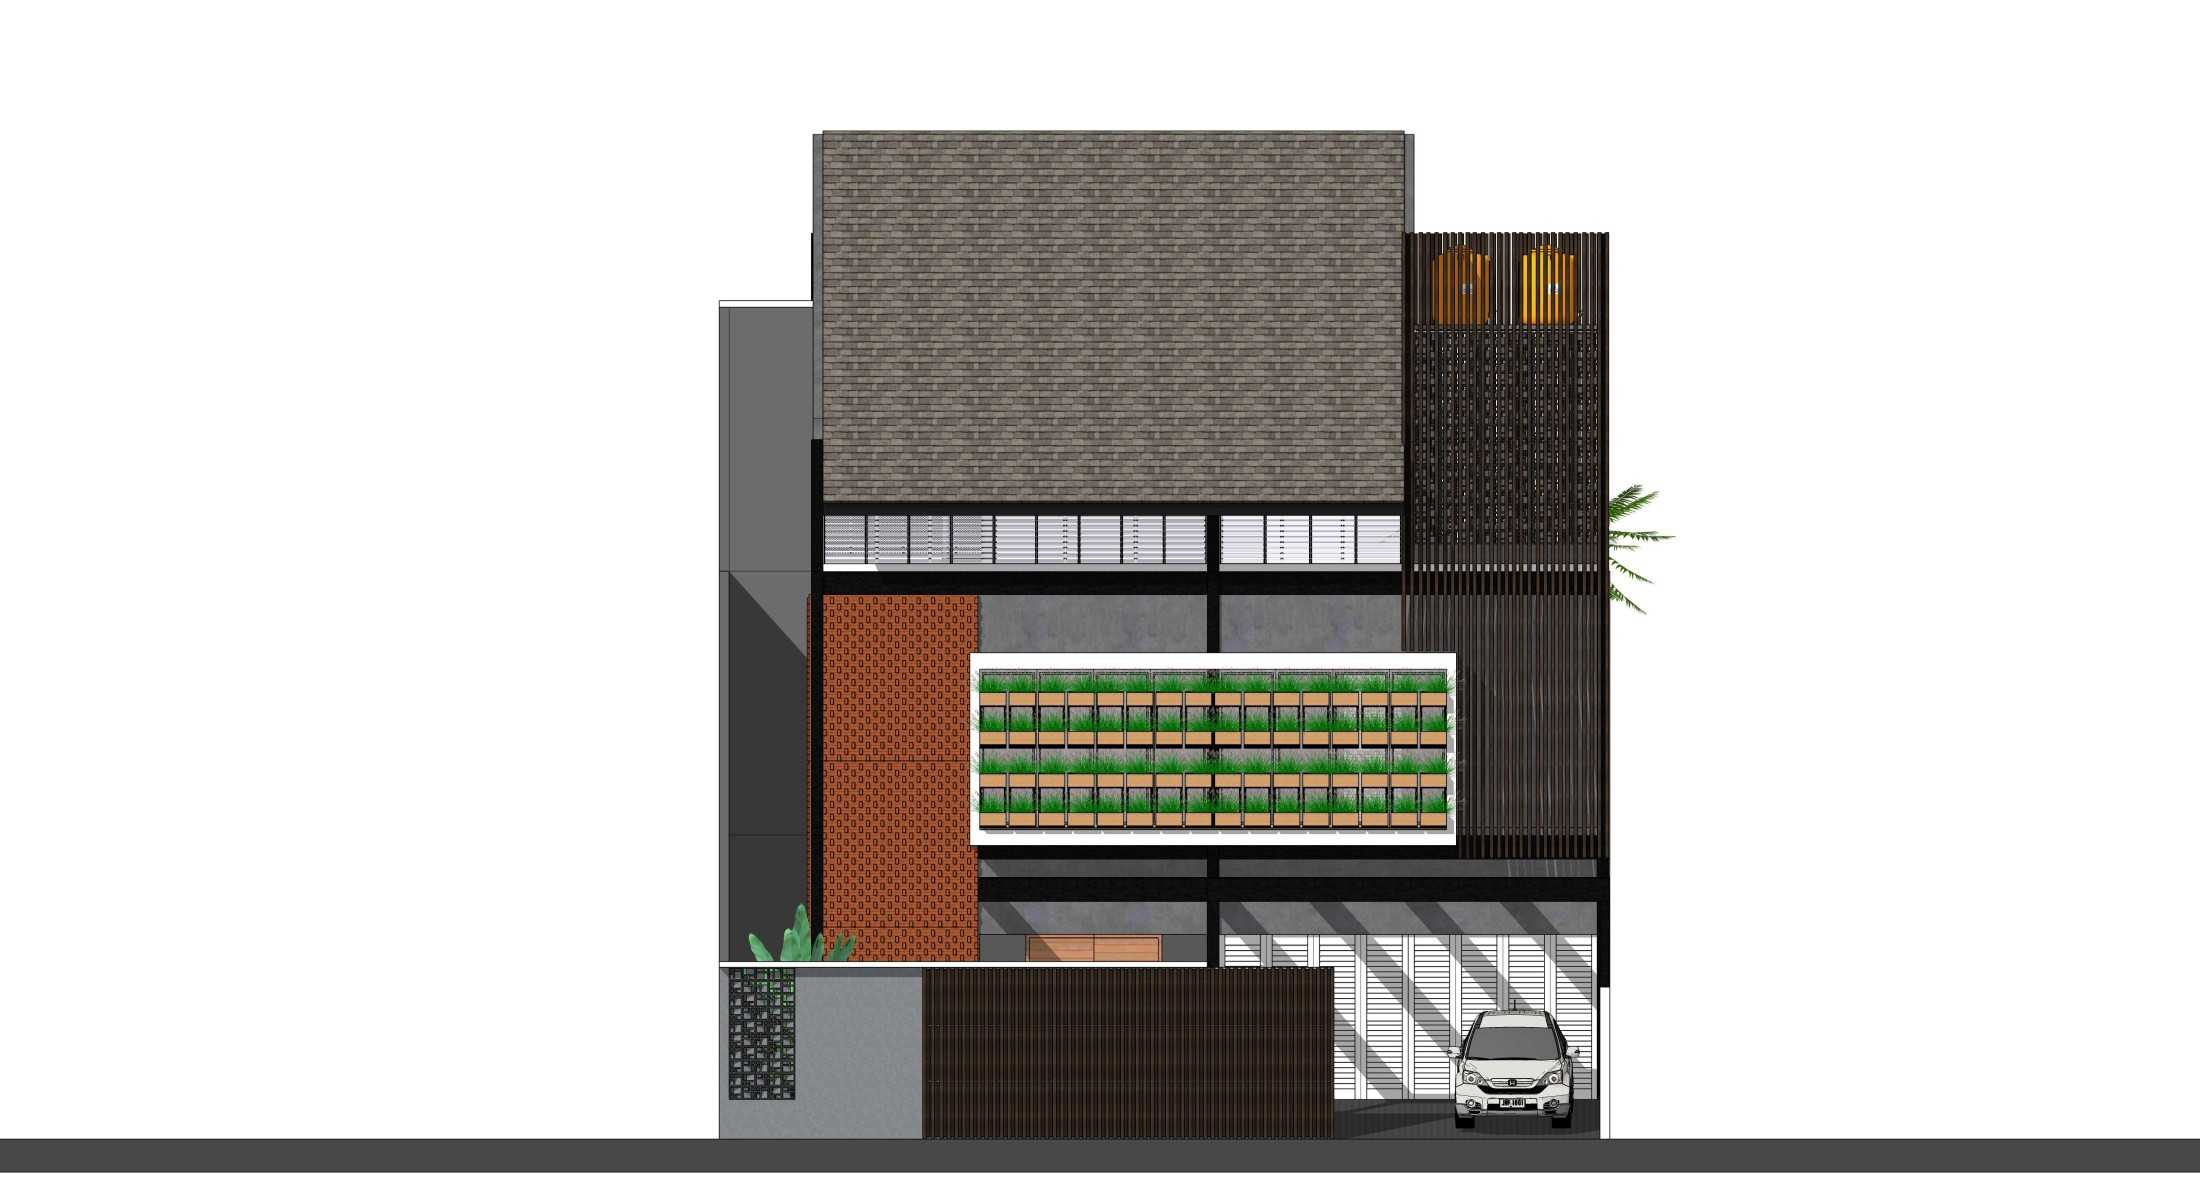 Triplus Homes Gg House Kec. Kby. Baru, Kota Jakarta Selatan, Daerah Khusus Ibukota Jakarta, Indonesia Kec. Kby. Baru, Kota Jakarta Selatan, Daerah Khusus Ibukota Jakarta, Indonesia Triplus-Homes-Gg-House  103299